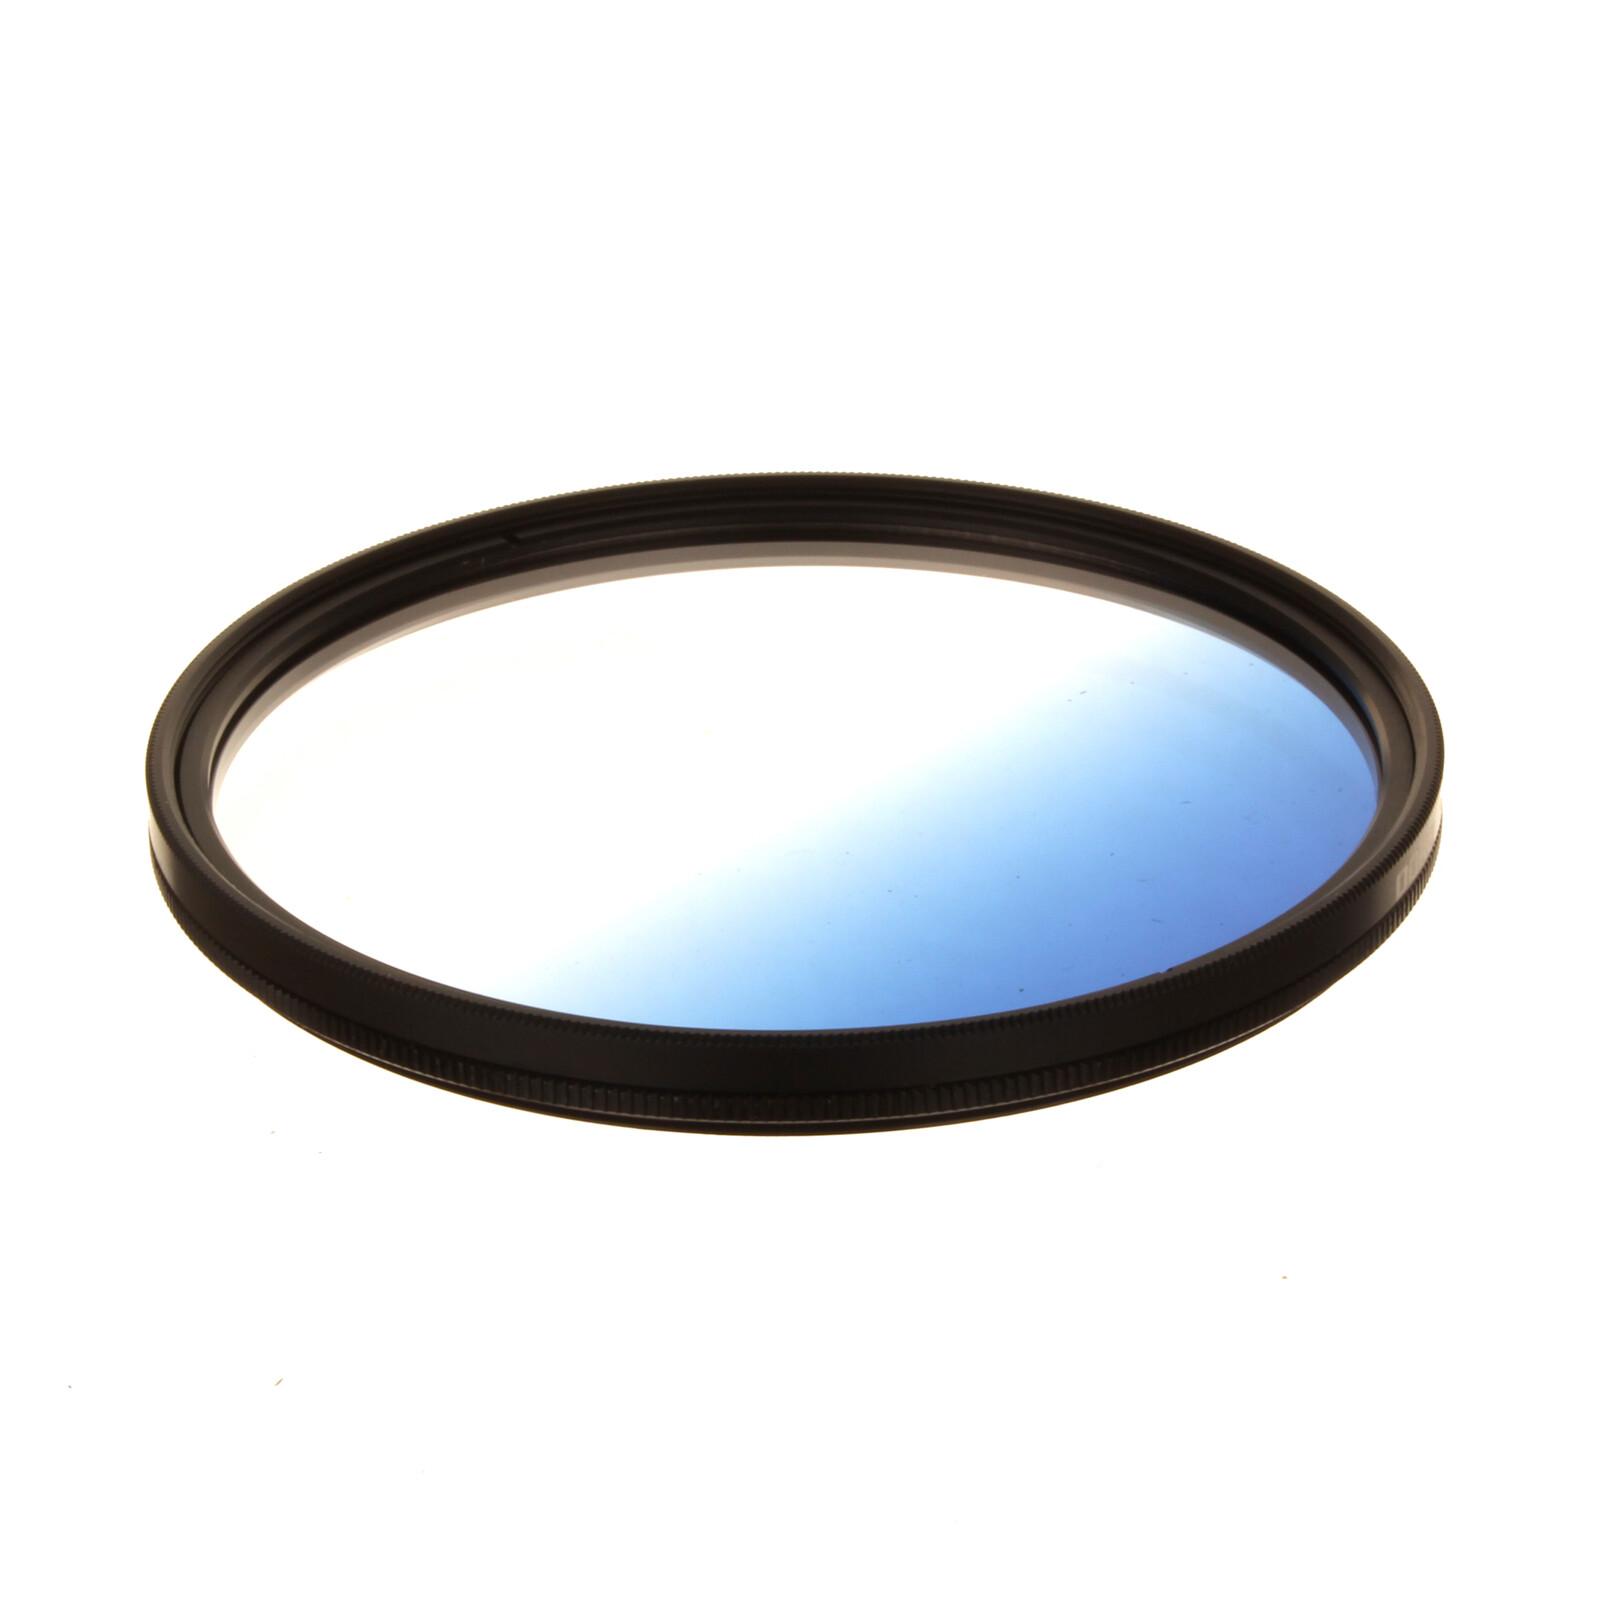 Dörr 318262 Verlaufsfilter Blau 62mm